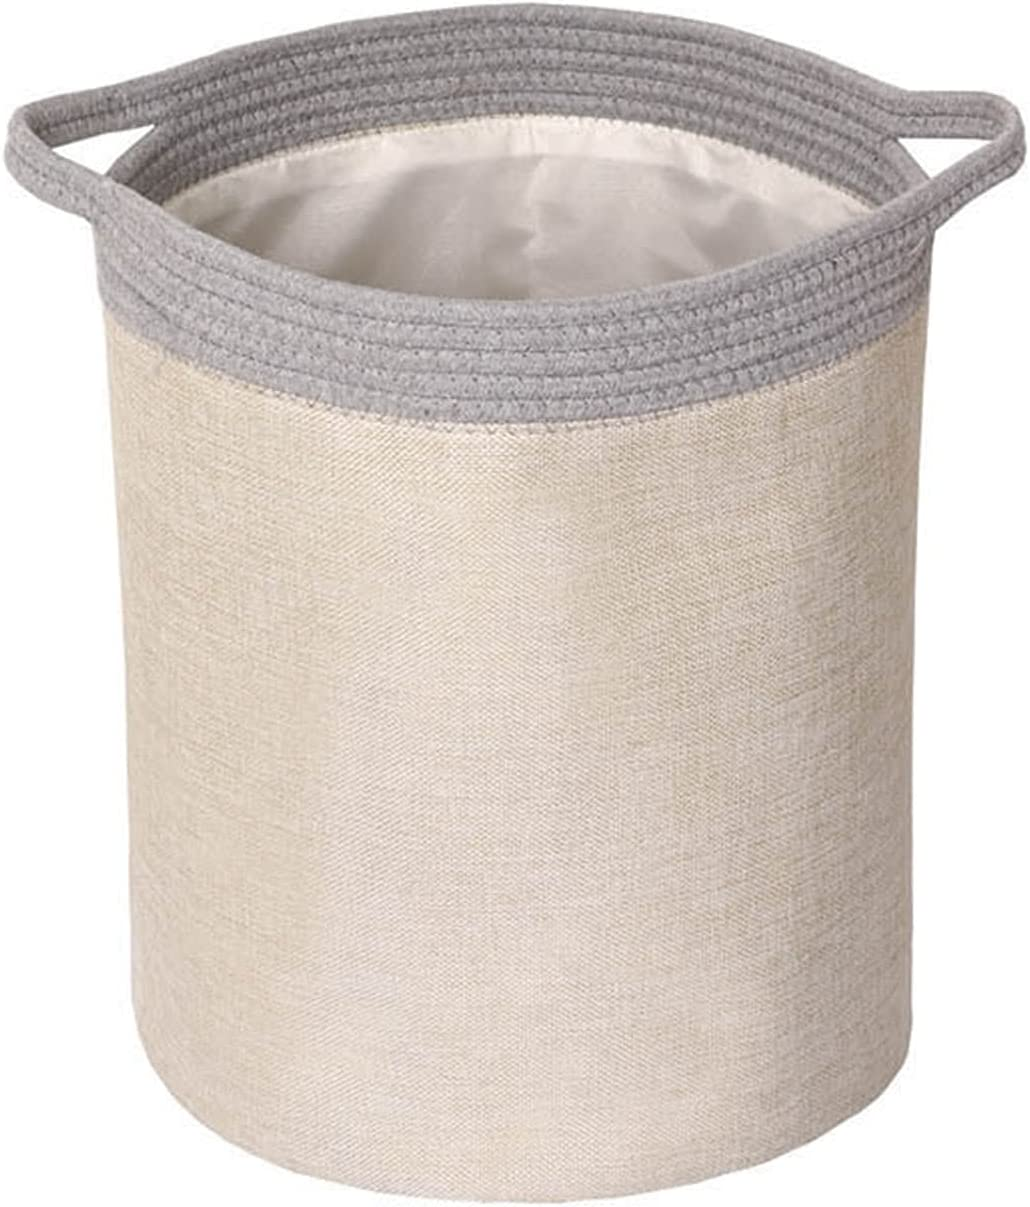 zhangmin Laundry Dealing full price Indefinitely reduction Hamper ,Storage with Handles Large Basket